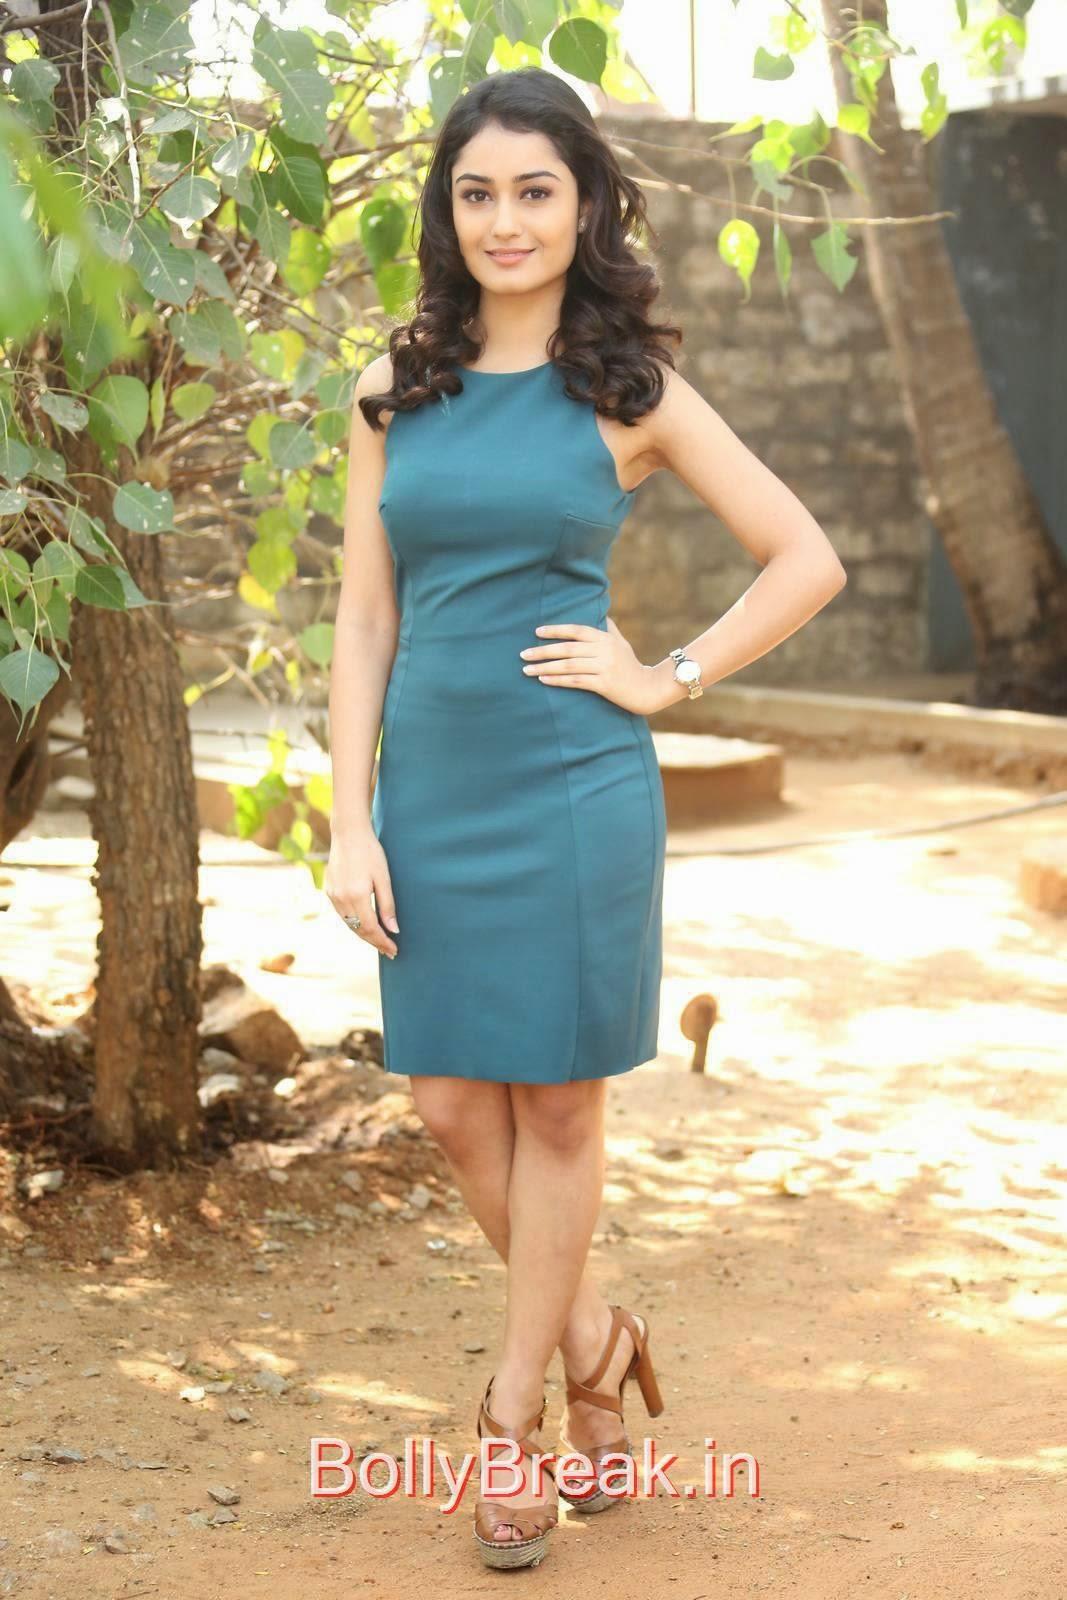 Tridha Choudhury Unseen Stills, Tridha Choudhury Hot Pics In Blue Dress